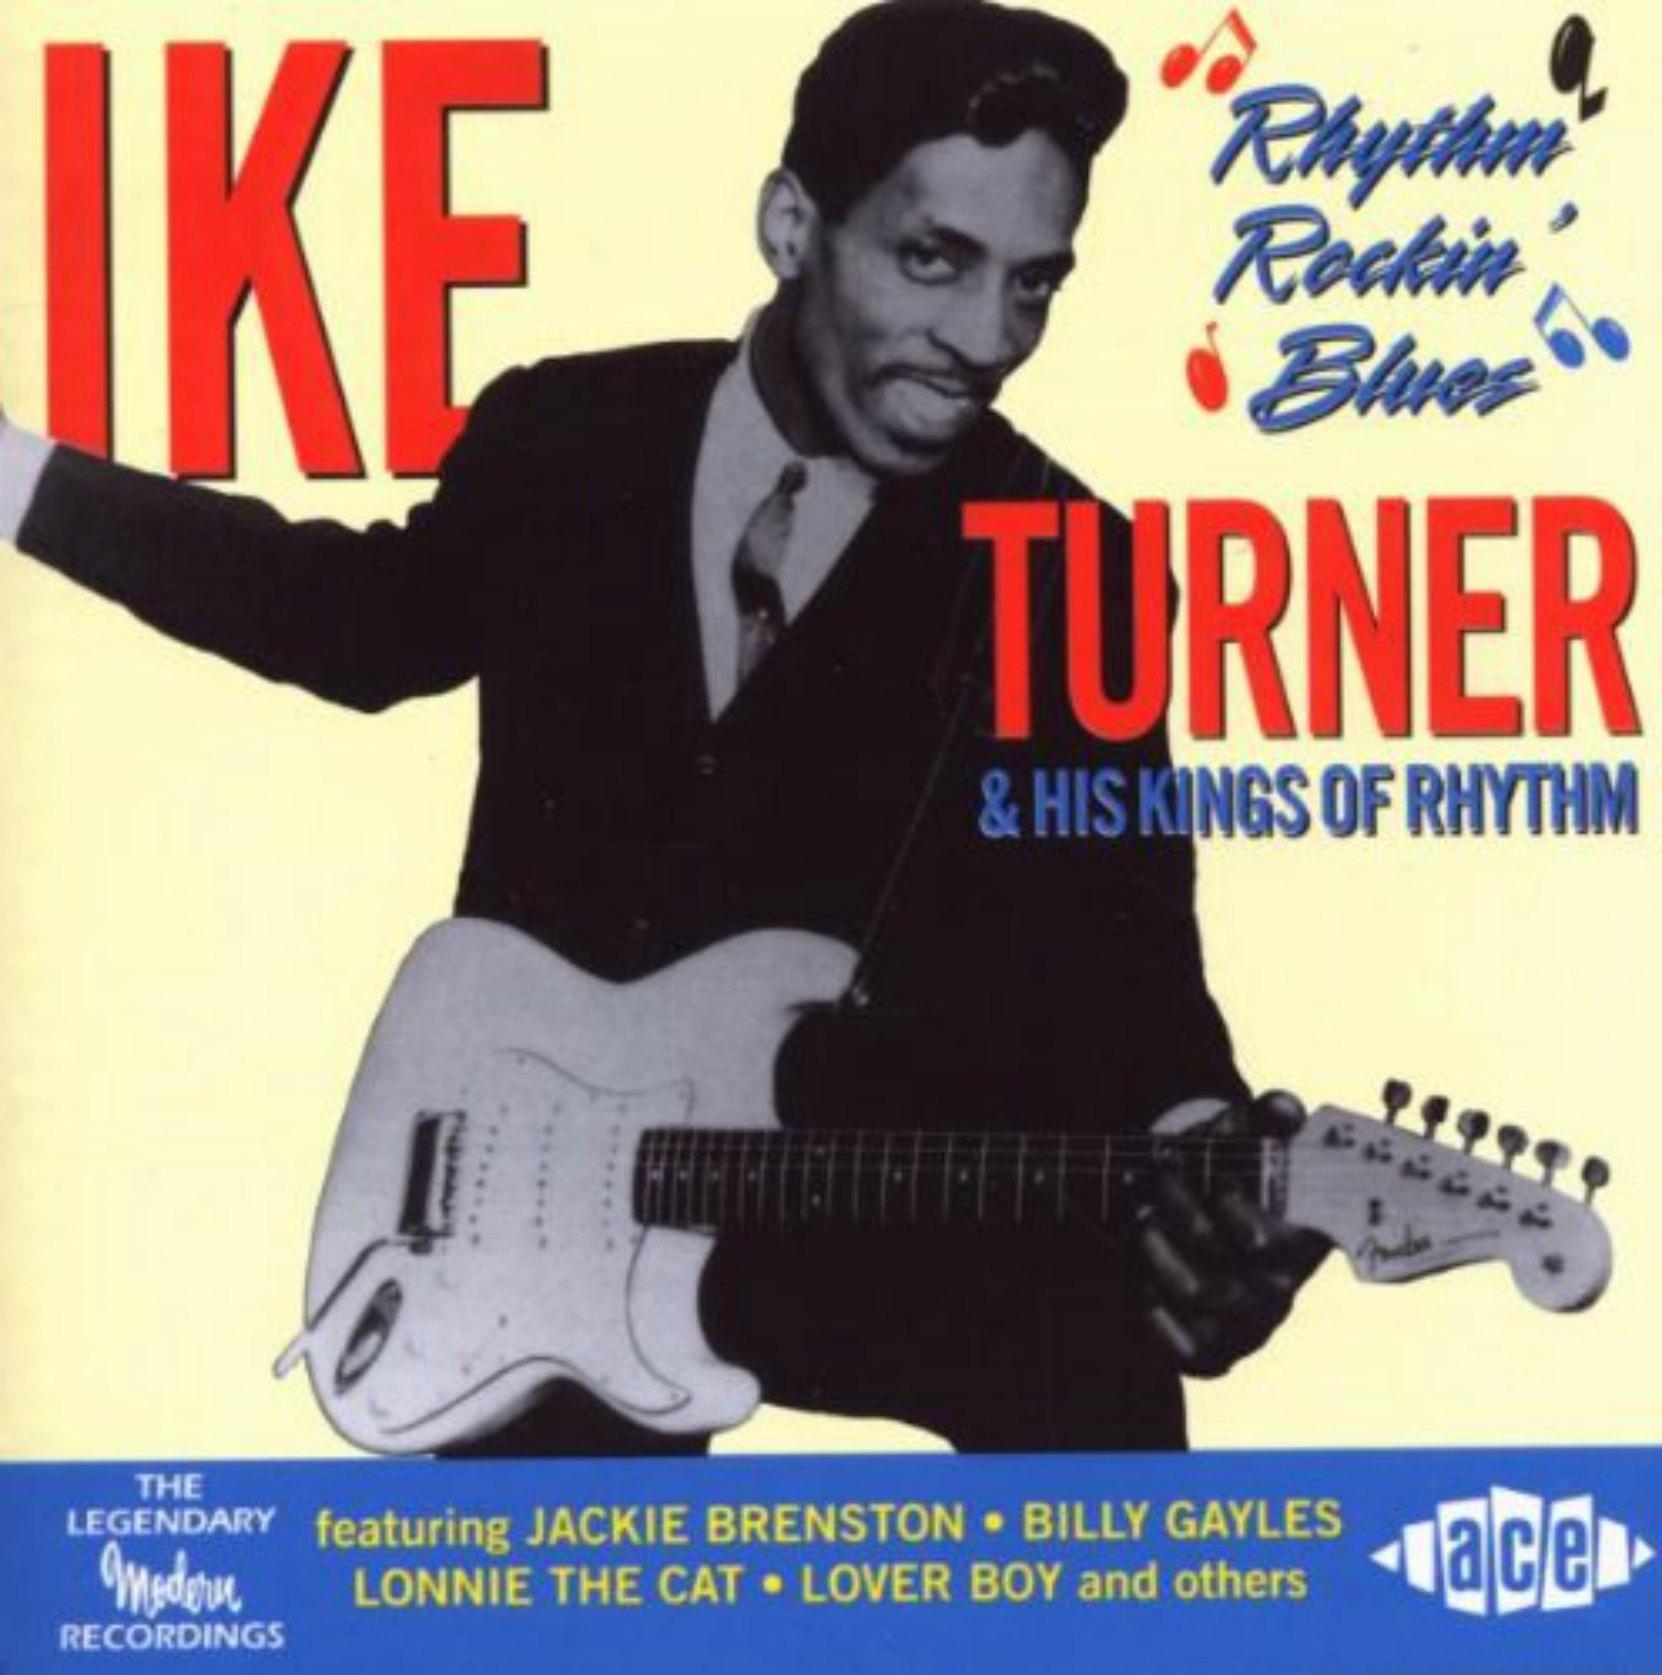 CD cover, Ike Turner & His Kings of Rhythm - Rhythm Rockin' Blues - on Ace Records